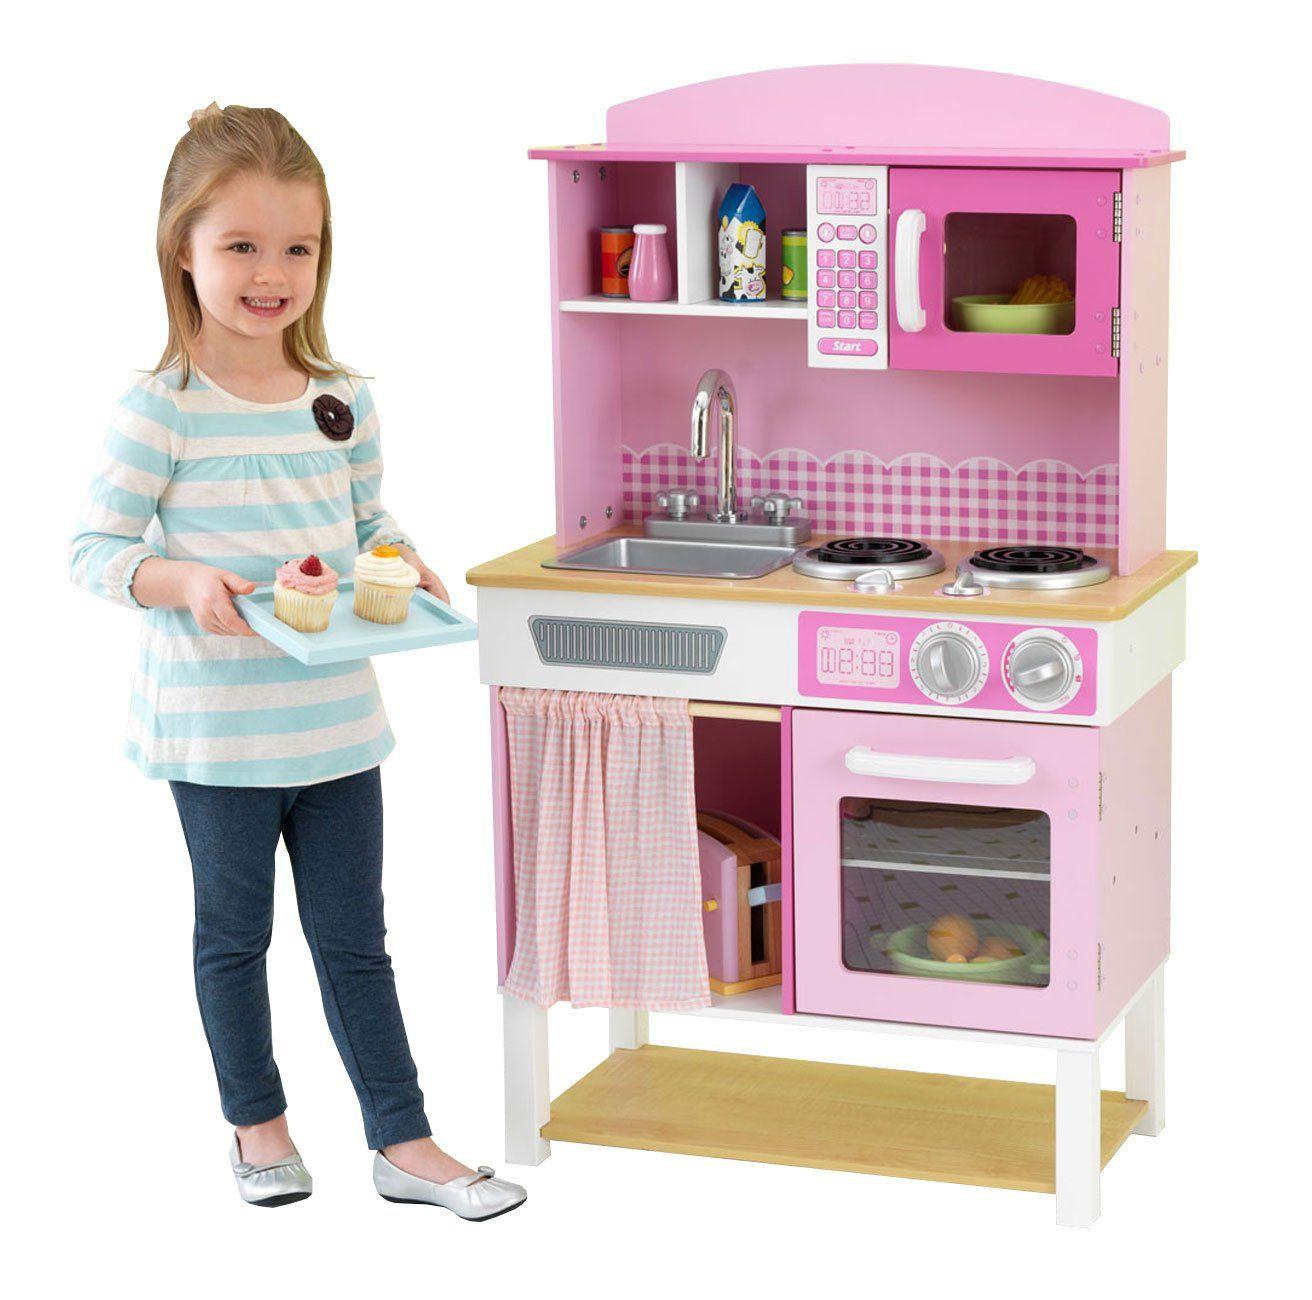 Kuchnia Drewniana Home Cookin Dla Dzieci Domowa Kidkraft Https Brykacze Pl Kuchnia Drewniana Home Cooki Childrens Play Kitchen Wooden Play Kitchen Kidkraft